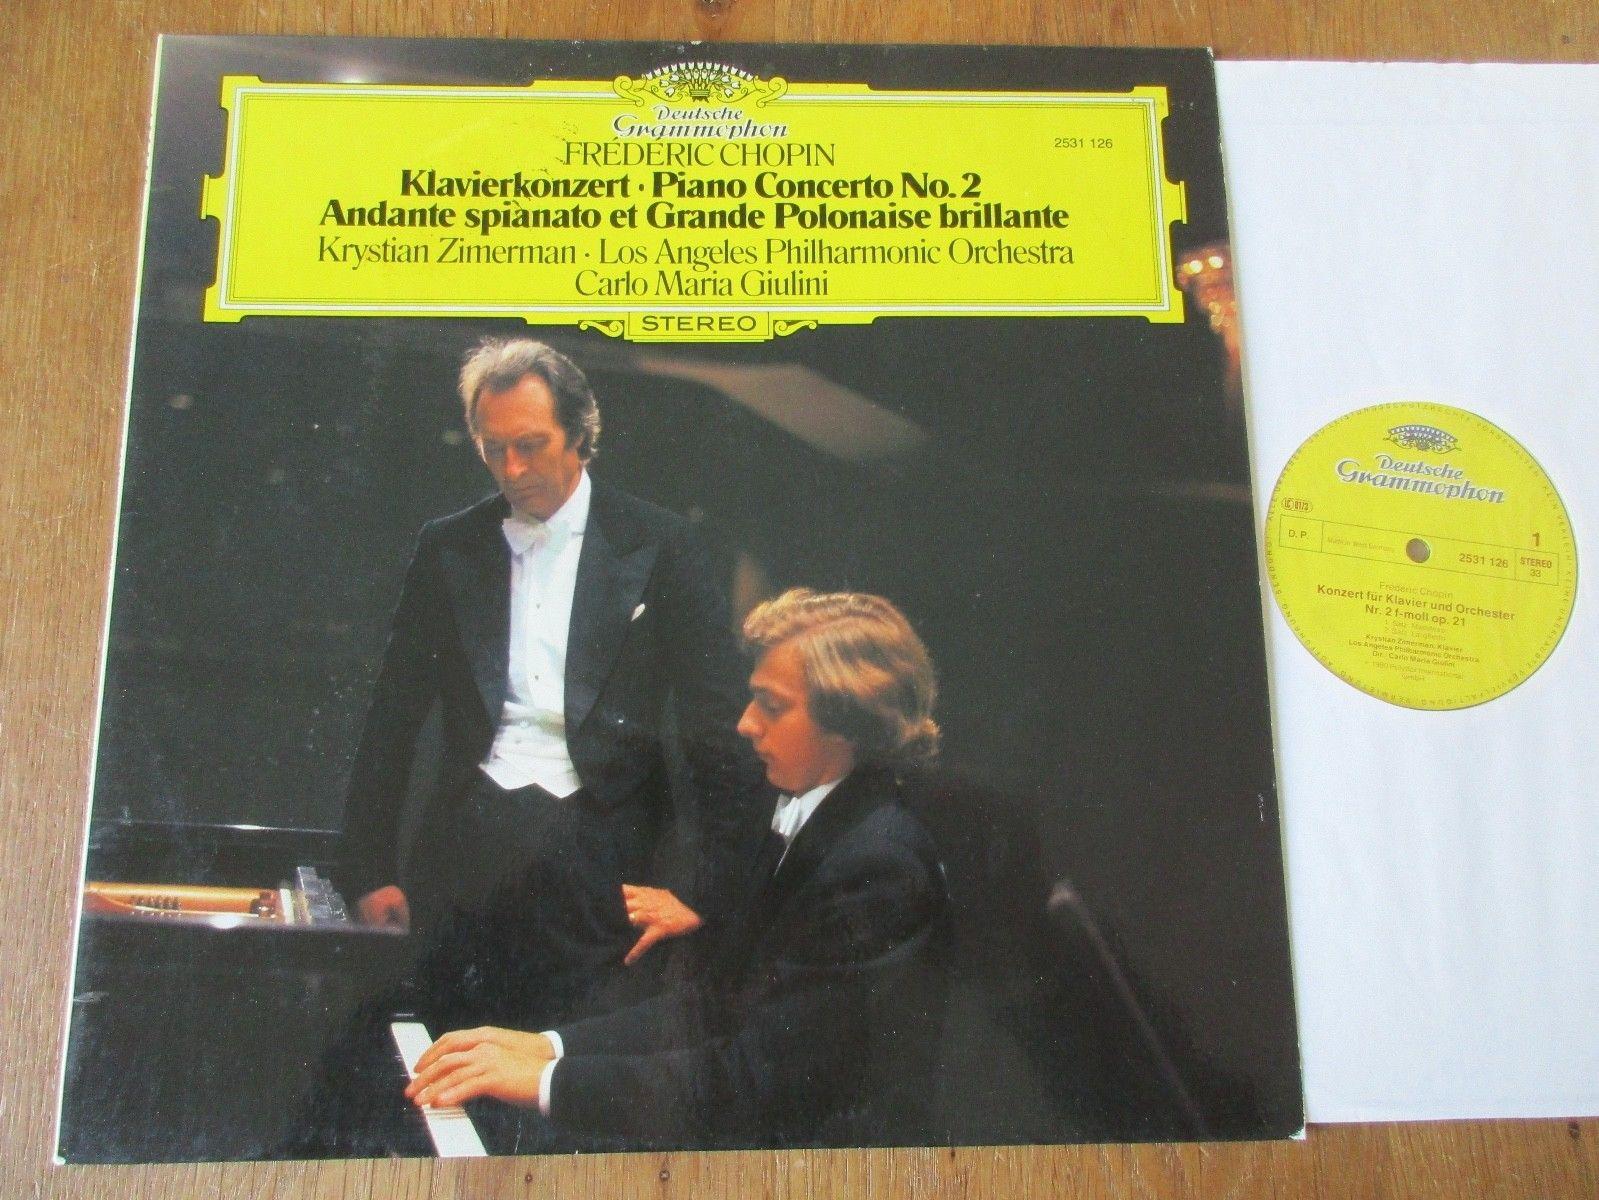 Chopin - Piano Conc 2 etc / Zimerman / LAPO / Giulini / DG 2531 126 / Stereo ED1